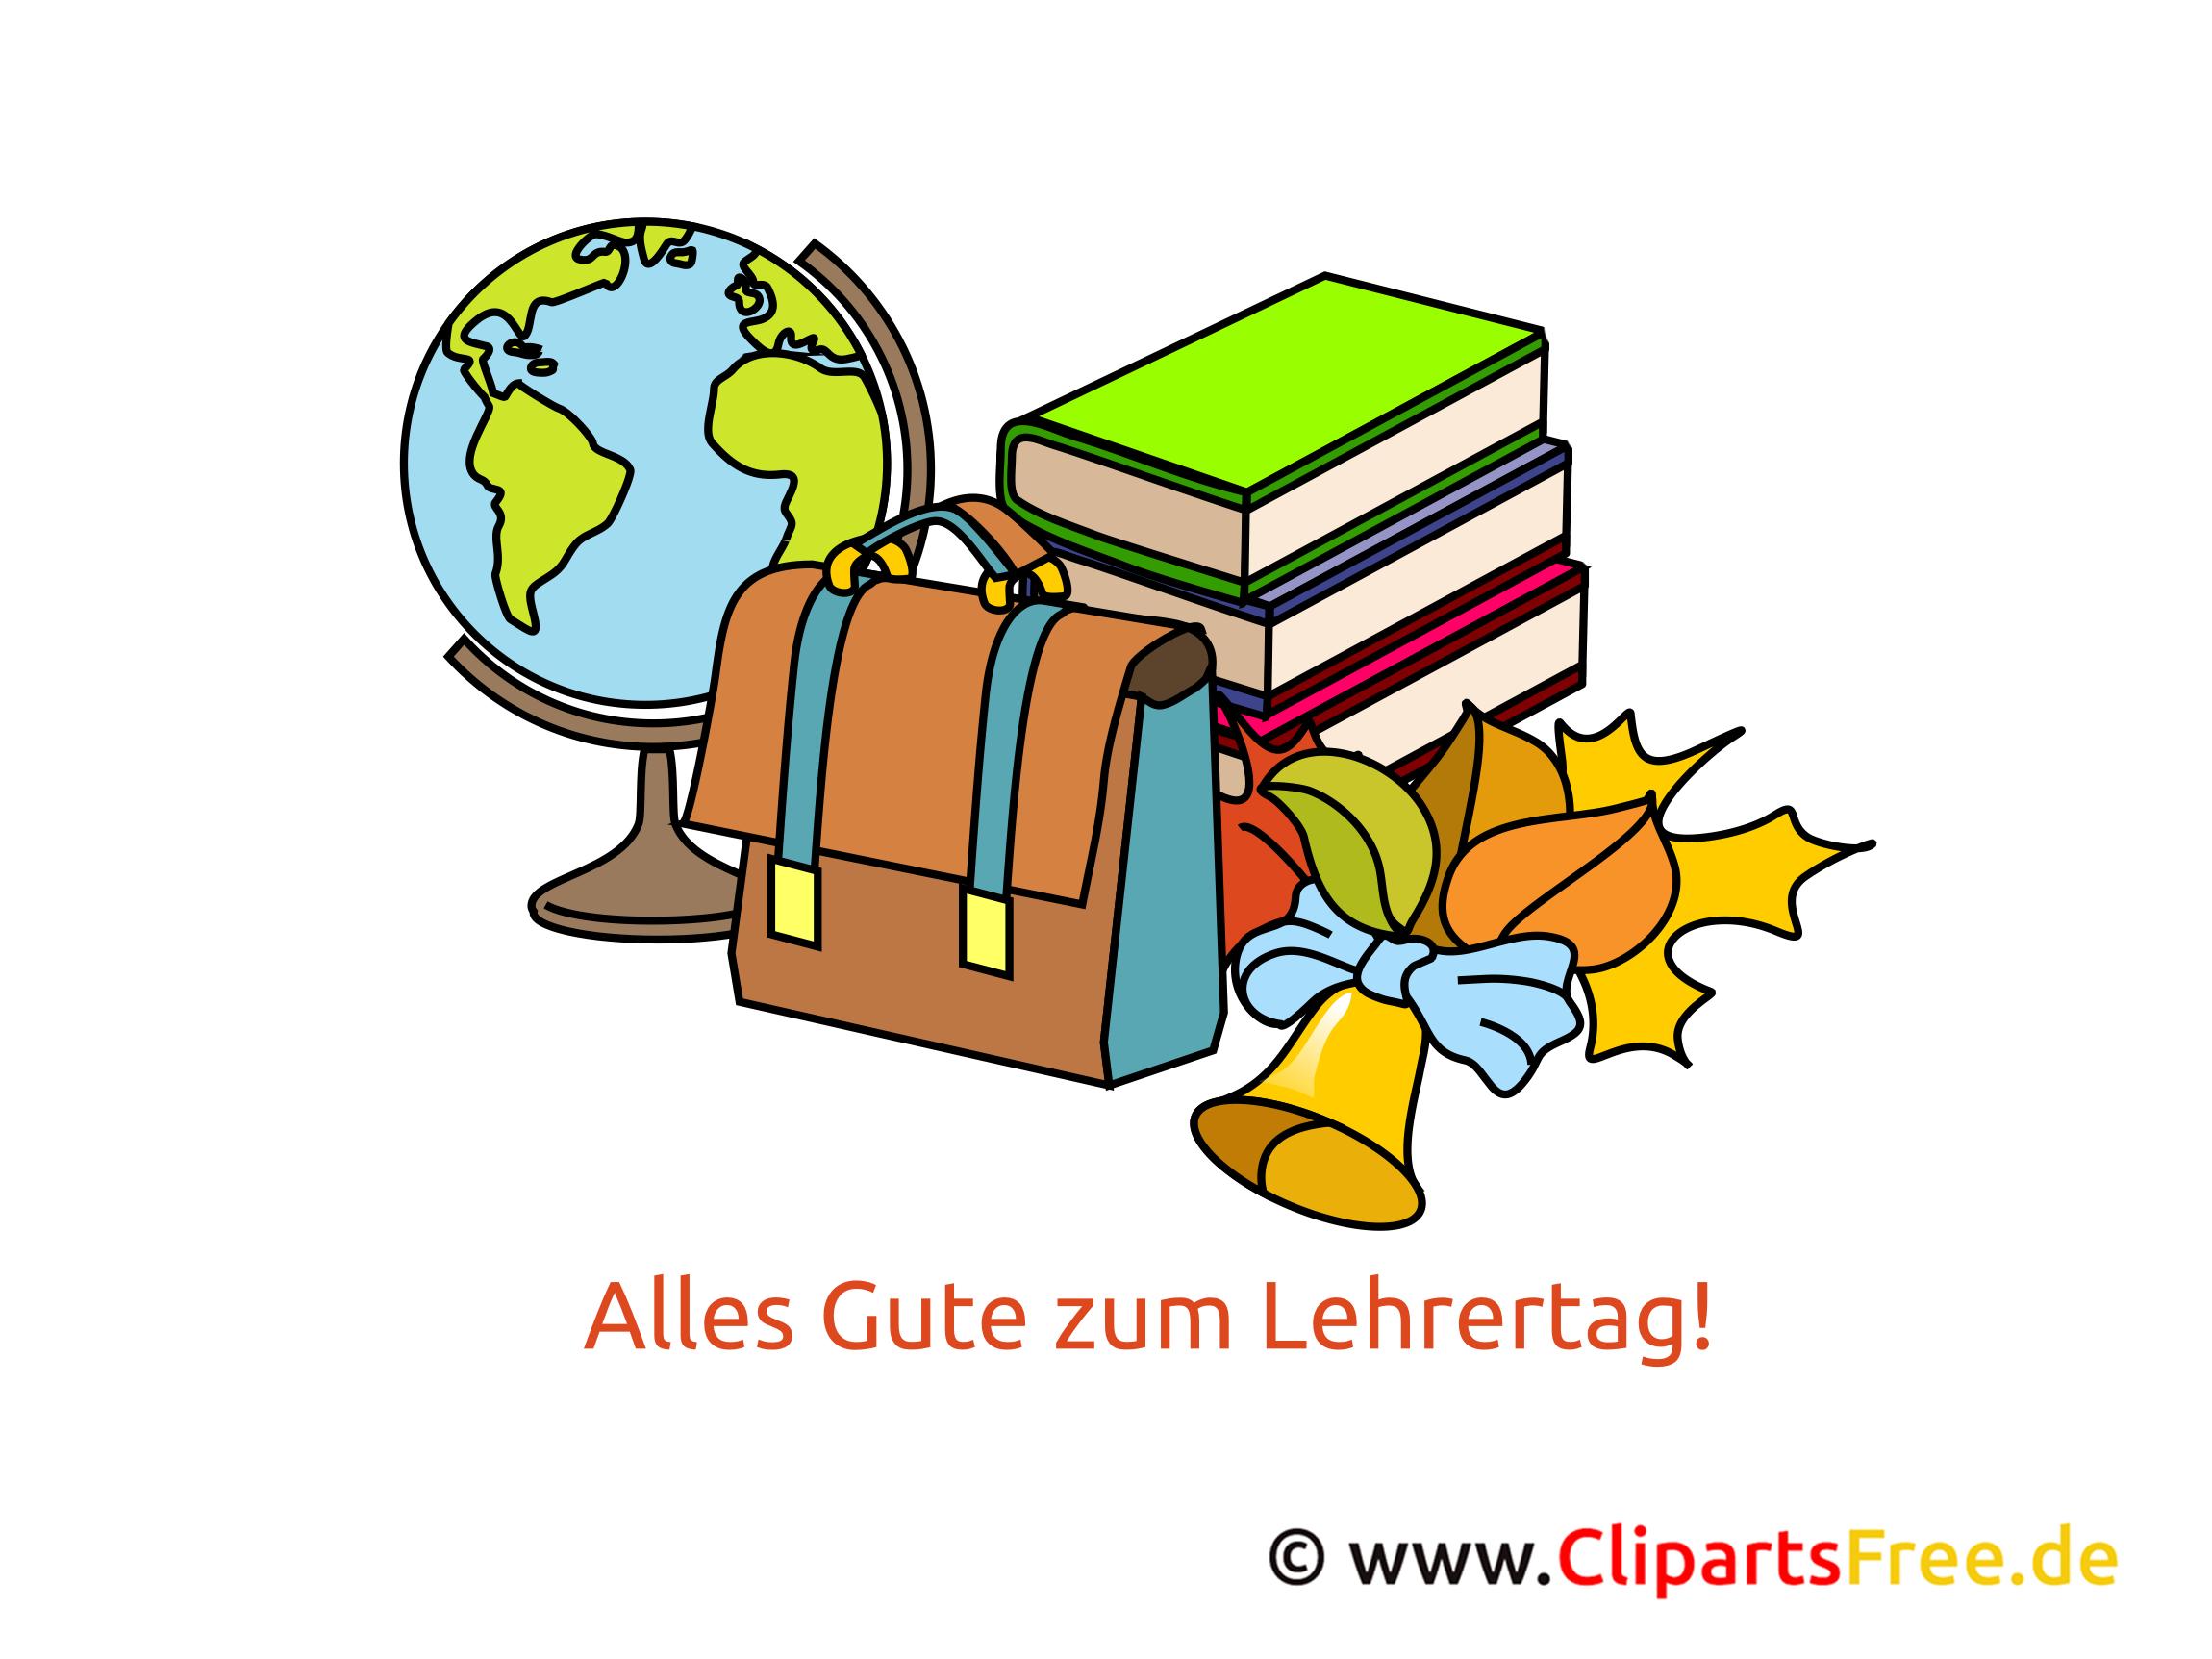 Internationaler Lehrertag  Clipart, Bild, Karte, Glueckwuensche